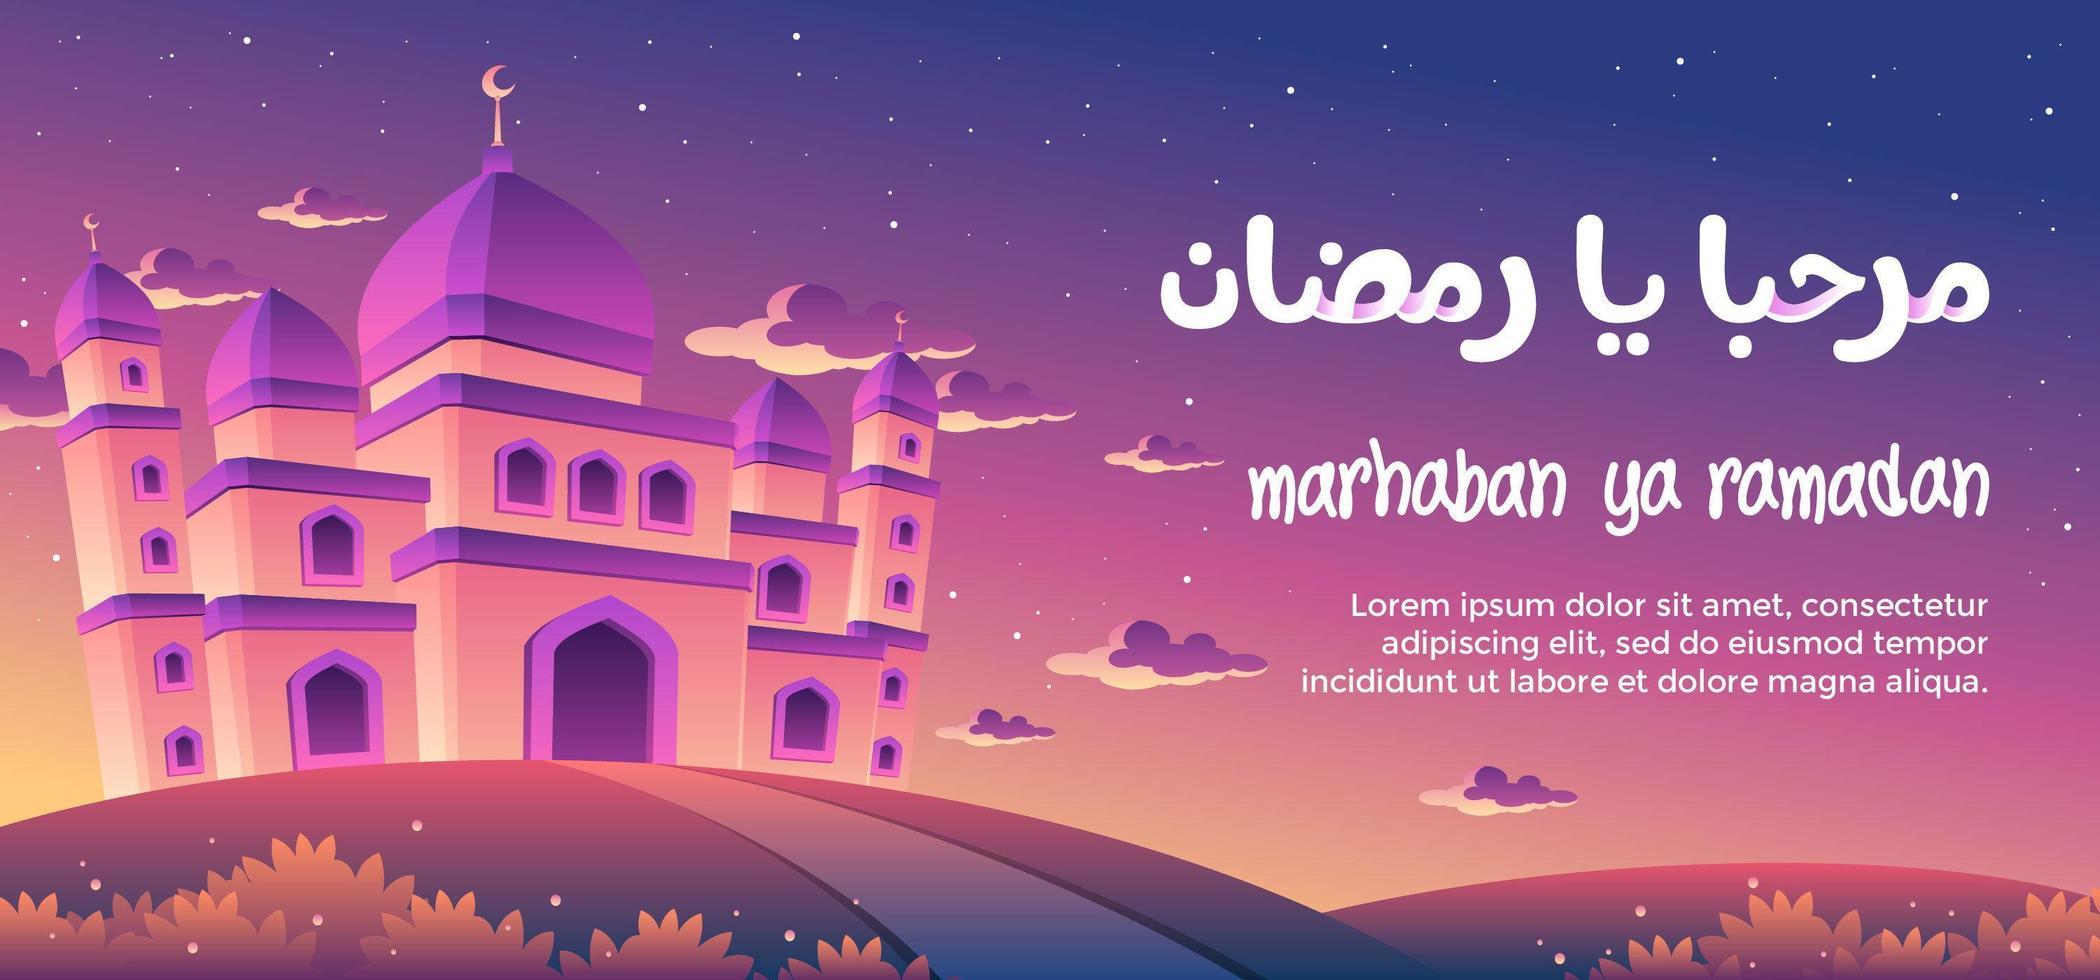 Marhaban Ya Ramadan With A Magnificent Mosque At Dusk vector